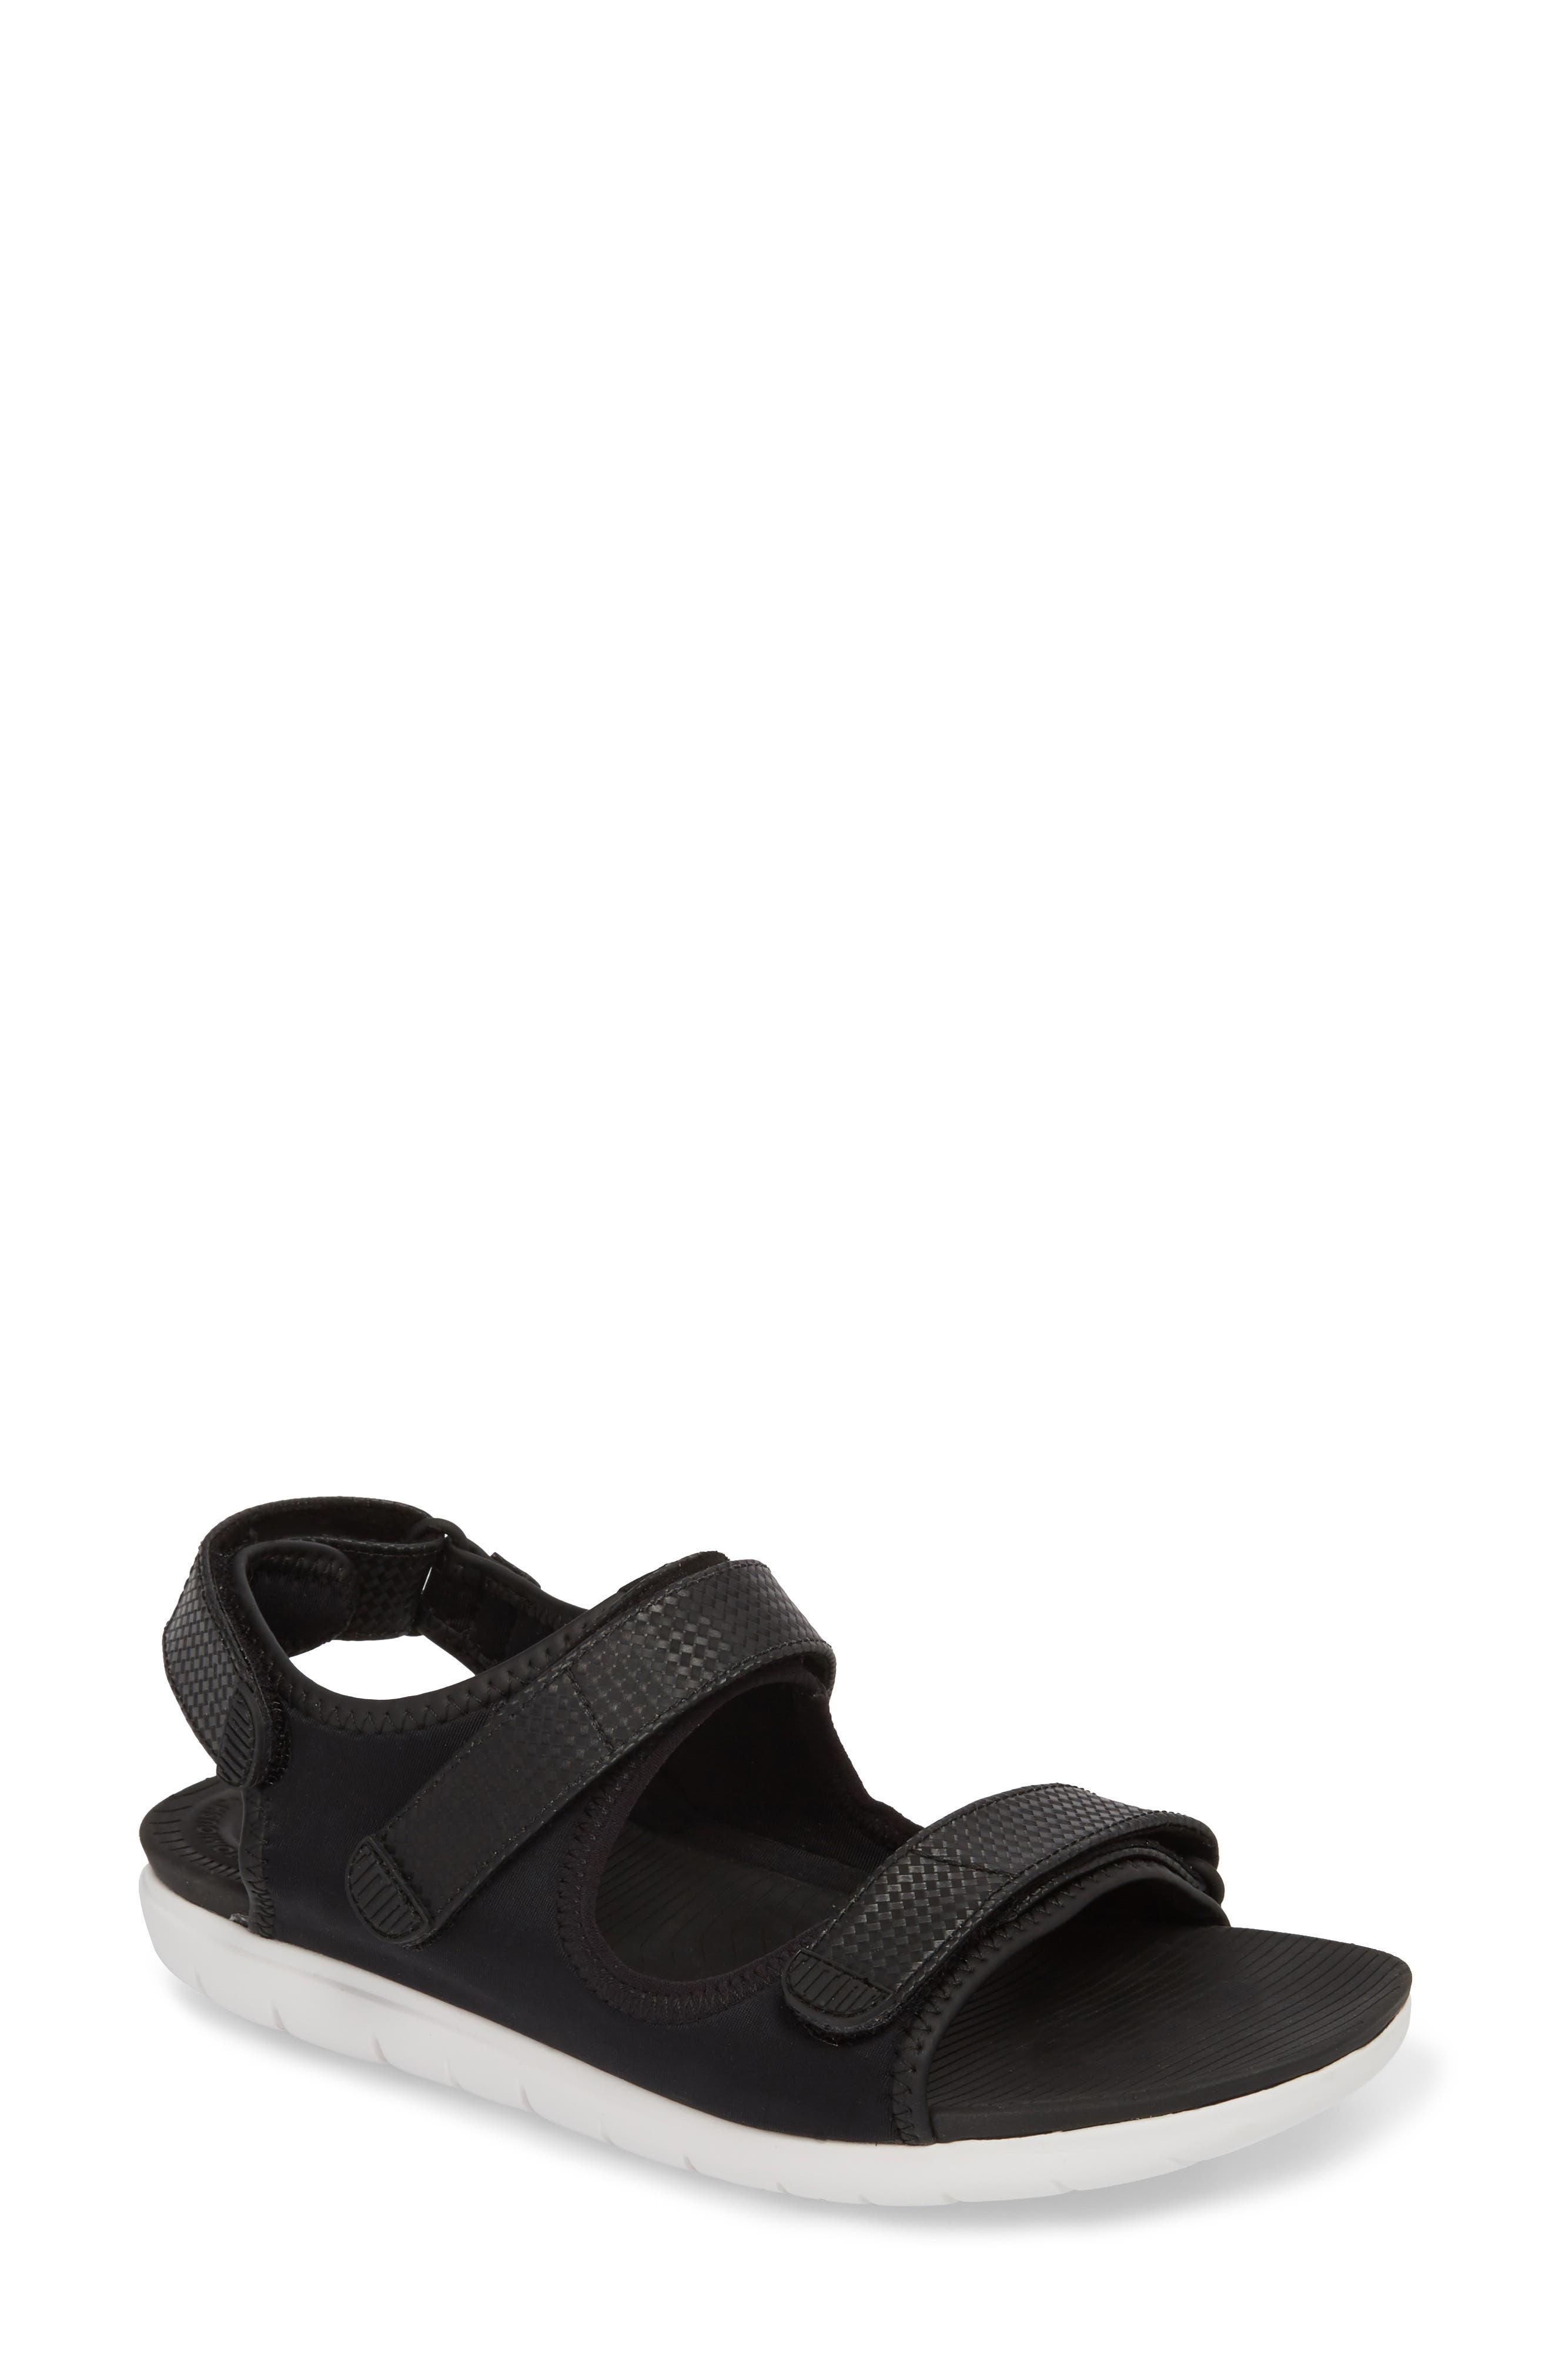 FitfFlop Neoflex<sup>™</sup> Back Strap Sandal,                         Main,                         color, Black Leather